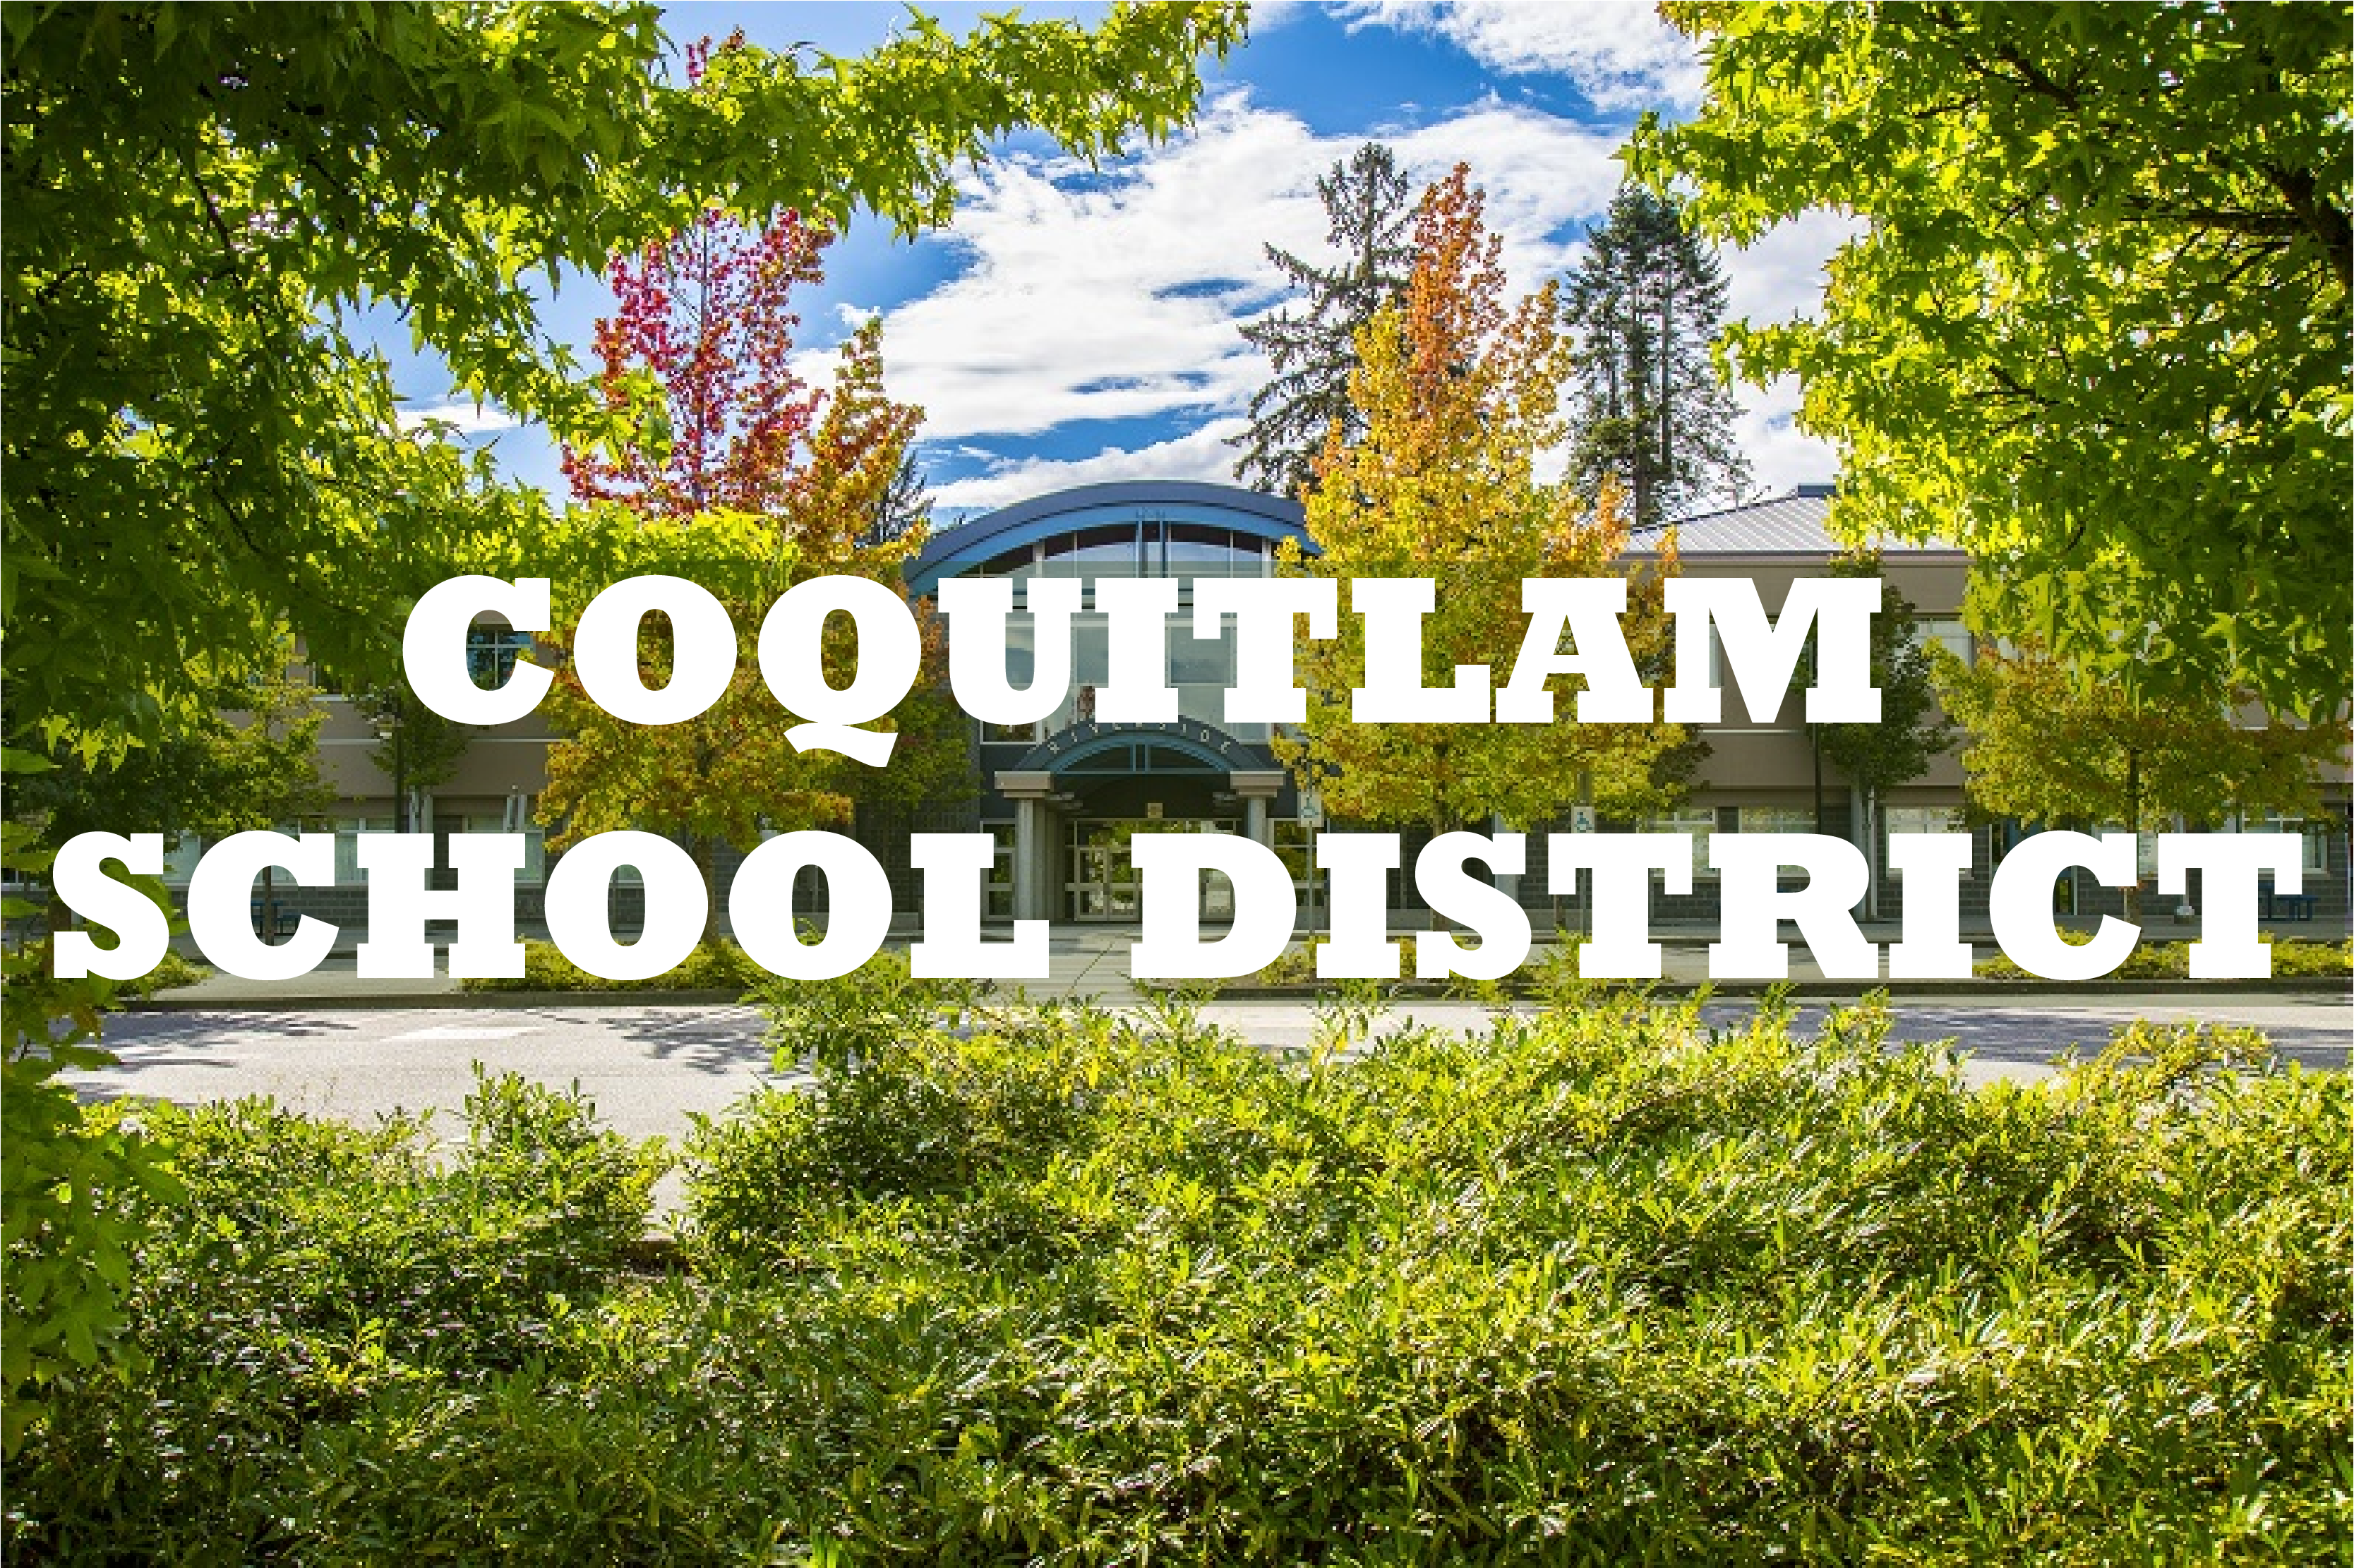 COQUITLAM SCHOOL DIST